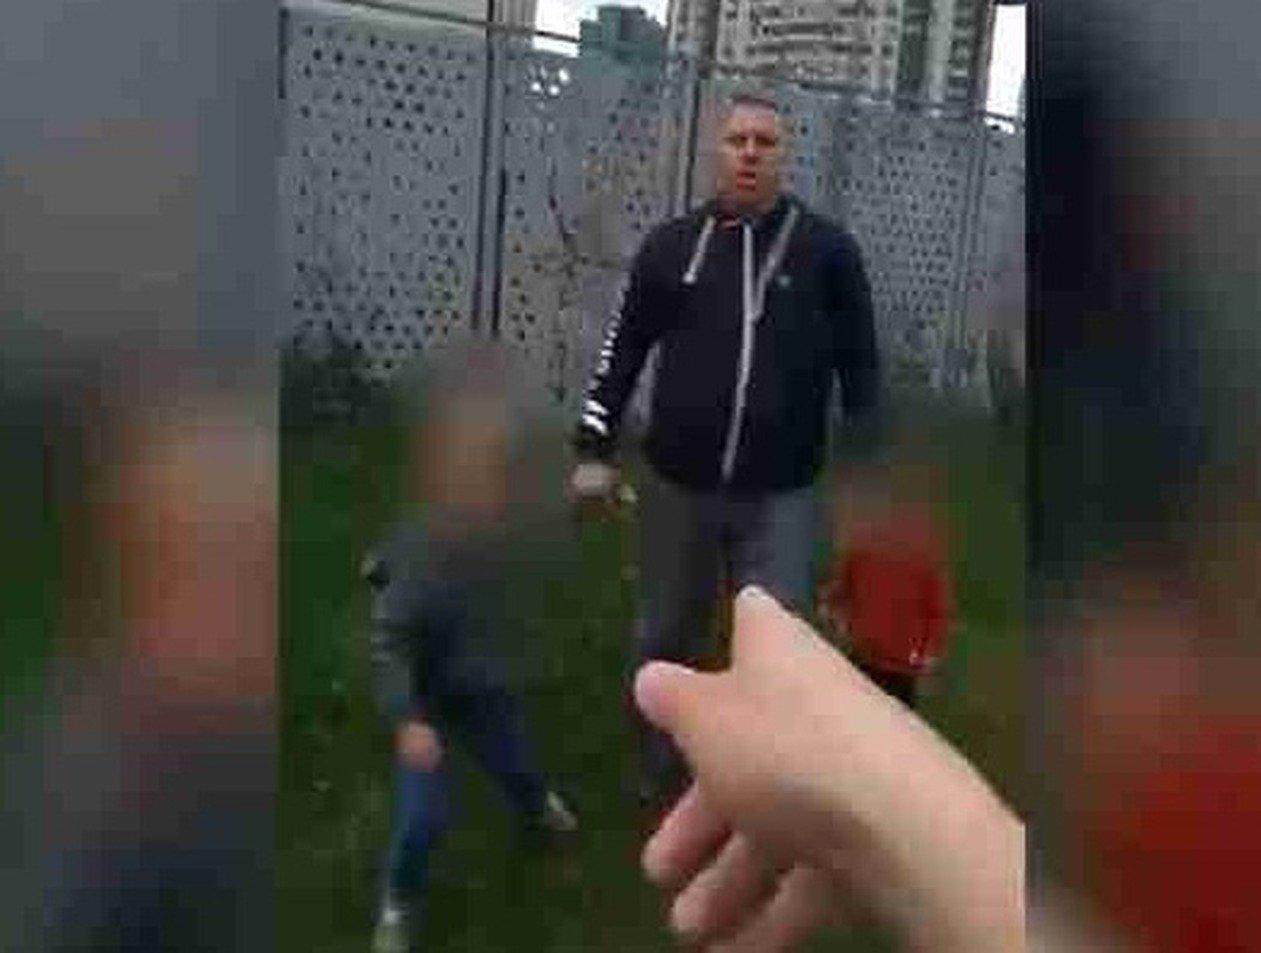 «Отпустите ребёнка!»: москвич подрался с 5-летним ребенком из-за игрушки